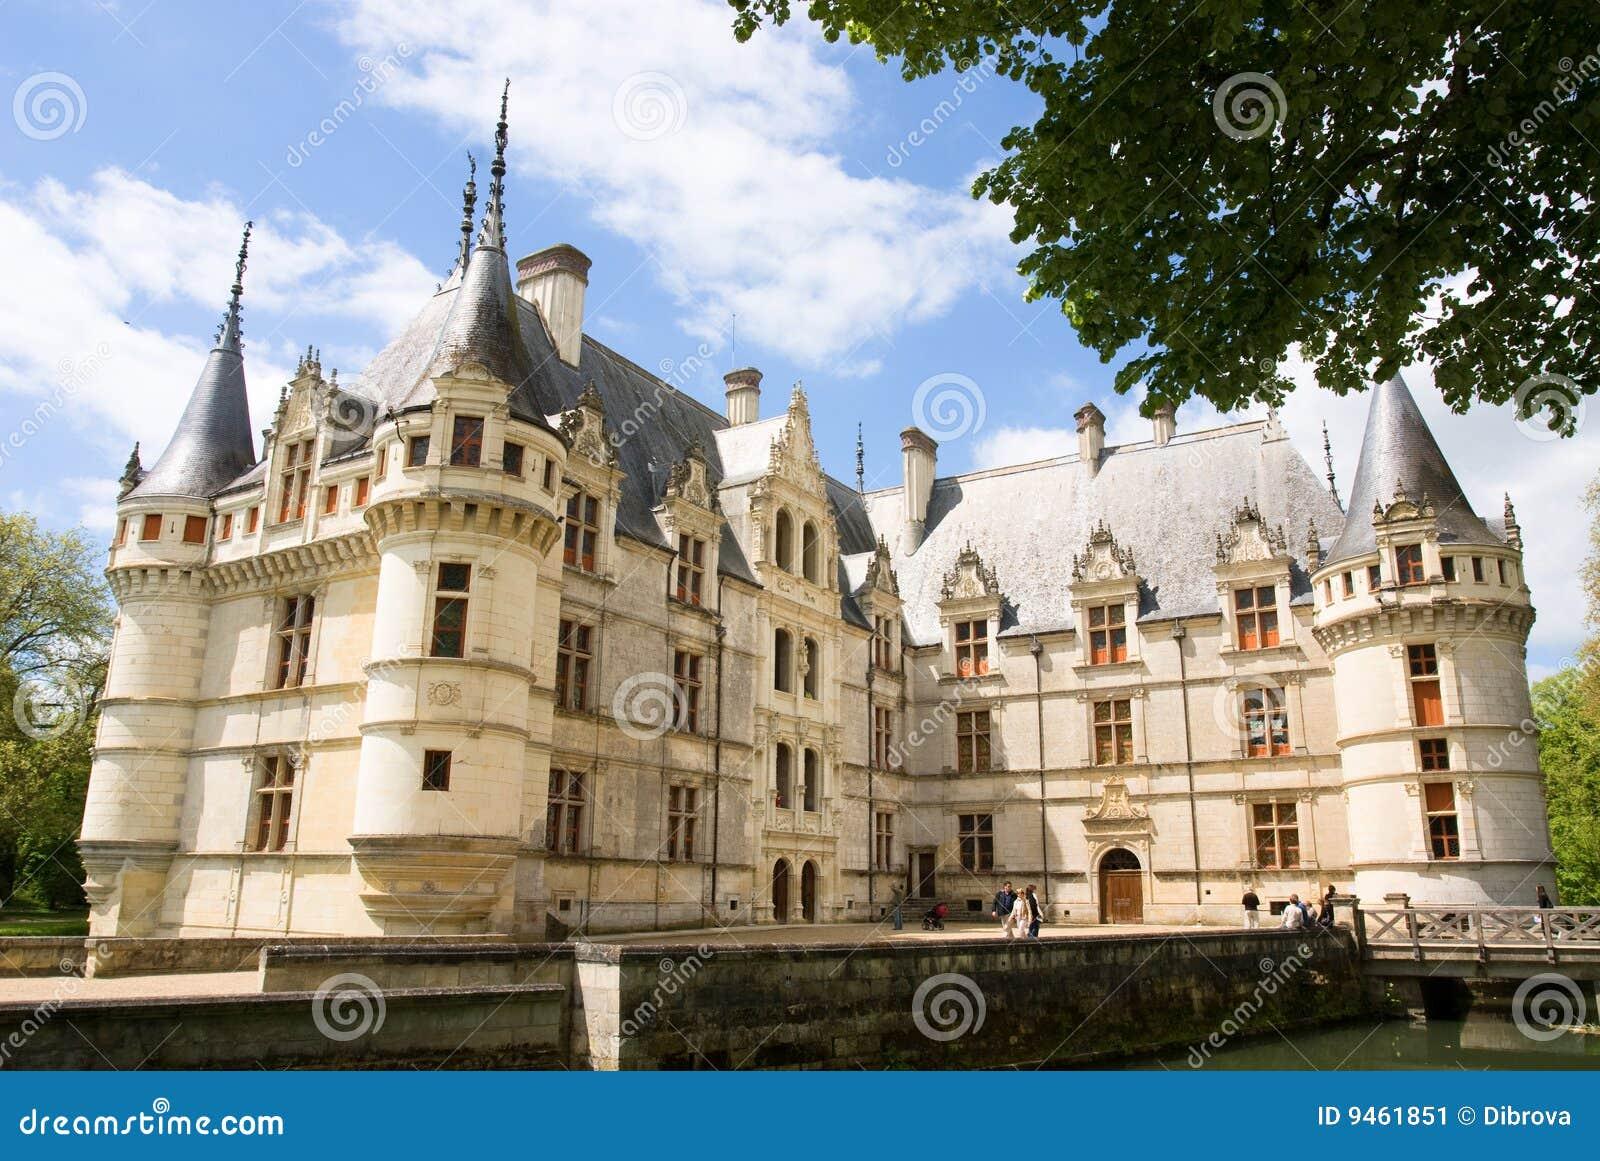 Chateau Azay Le Rideau Stock Image Image Of Tourist Renaissance